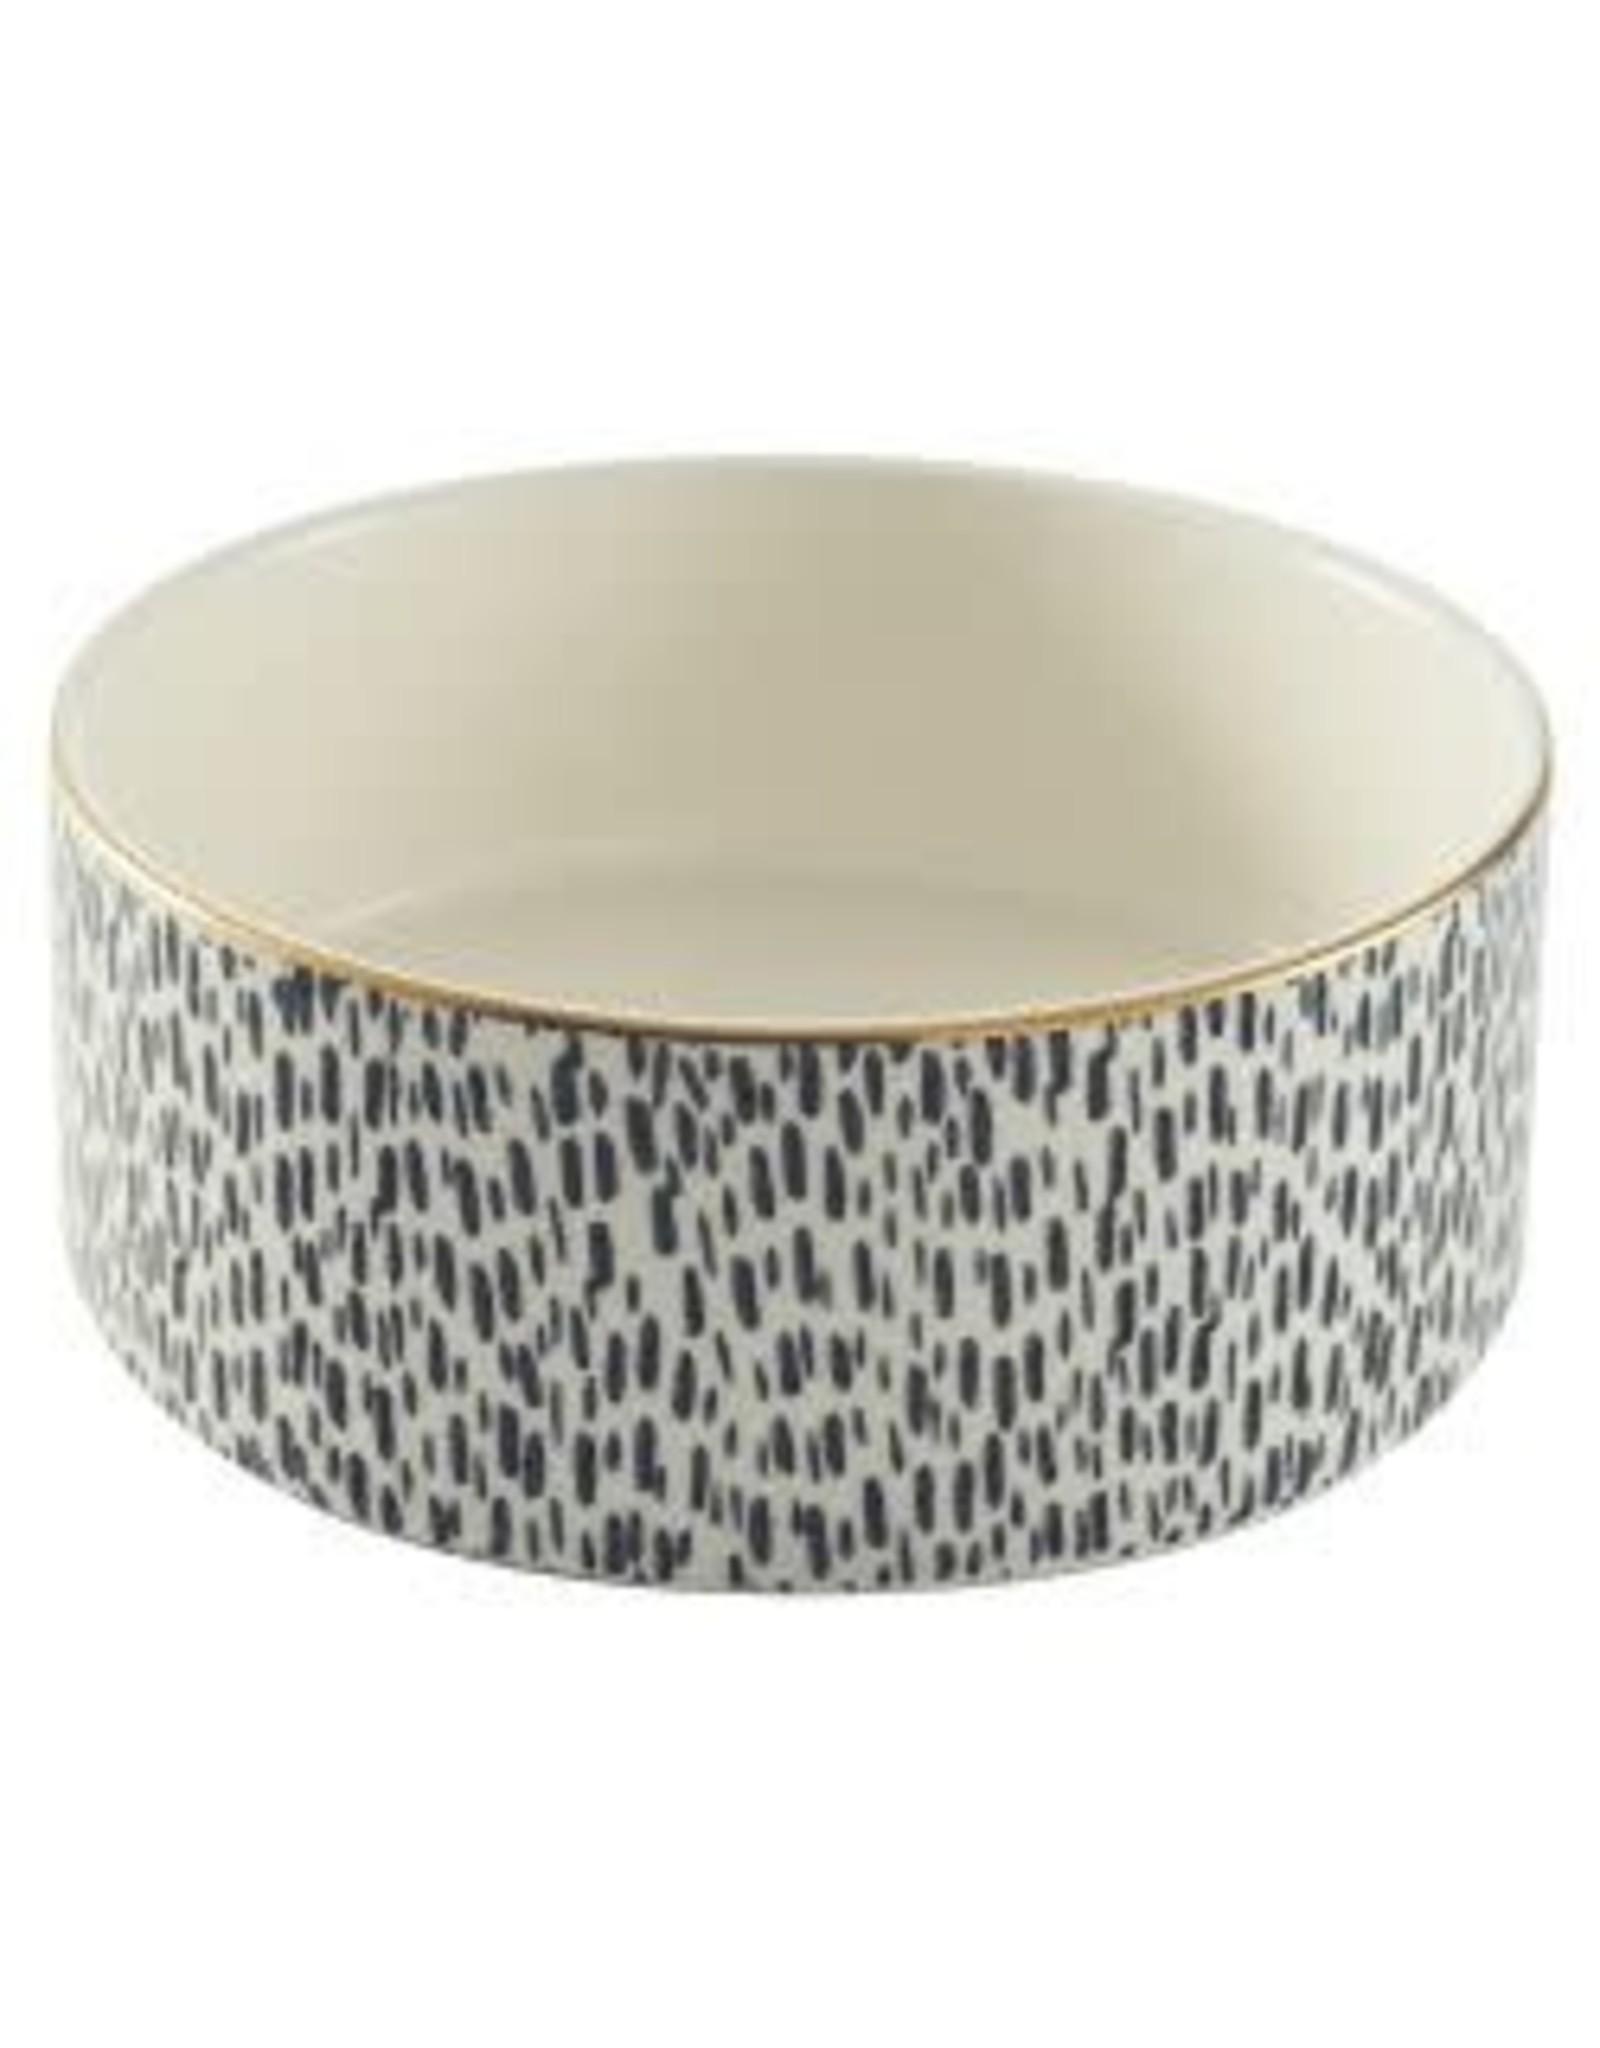 Mason Cash MC Splatter Gold Rim Bowl